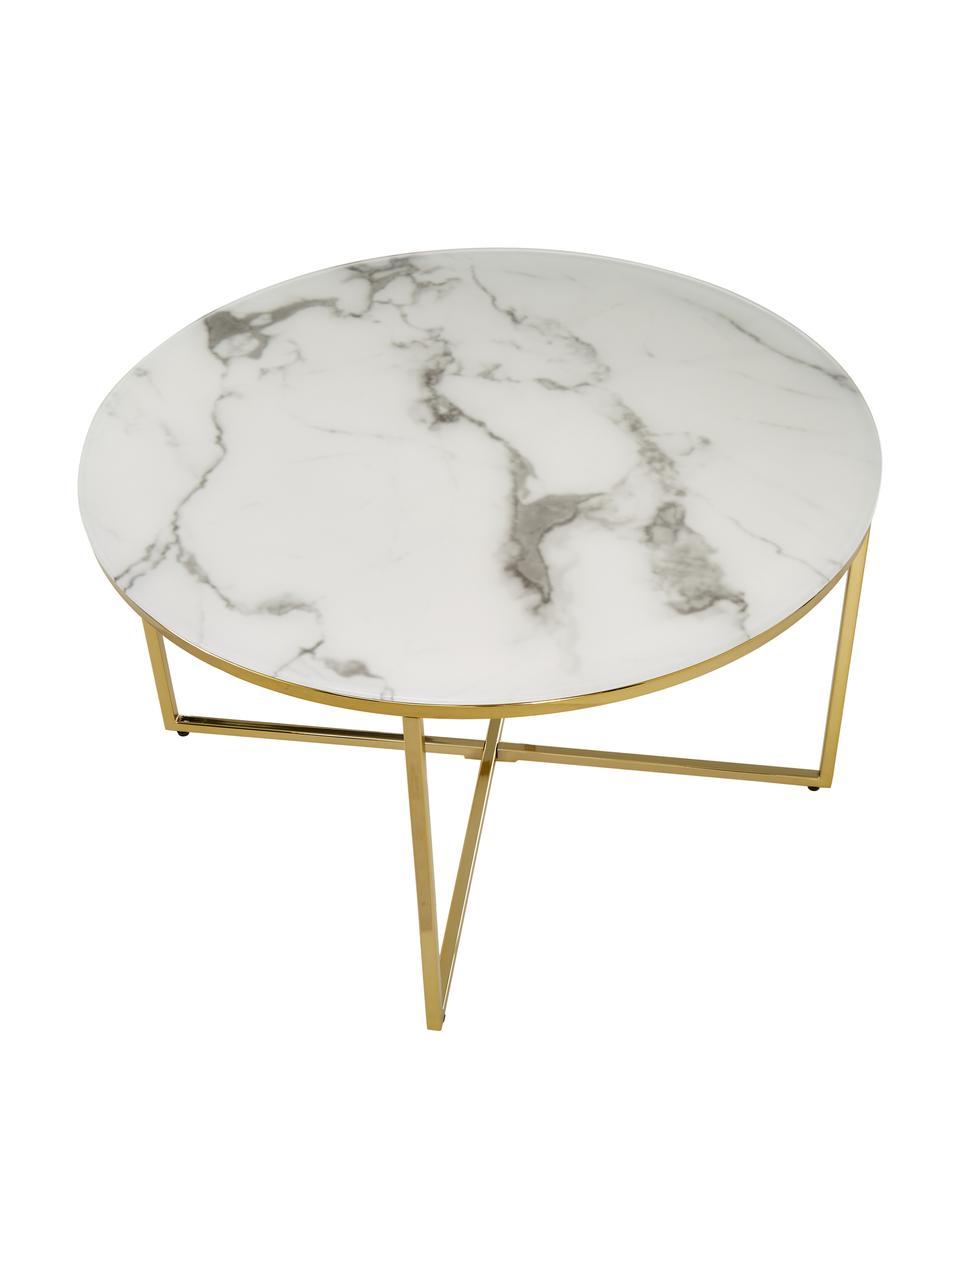 Couchtisch Antigua mit marmorierter Glasplatte, Tischplatte: Glas, matt bedruckt, Gestell: Metall, vermessingt, Weiss-grau marmoriert, Messing, Ø 80 x H 45 cm